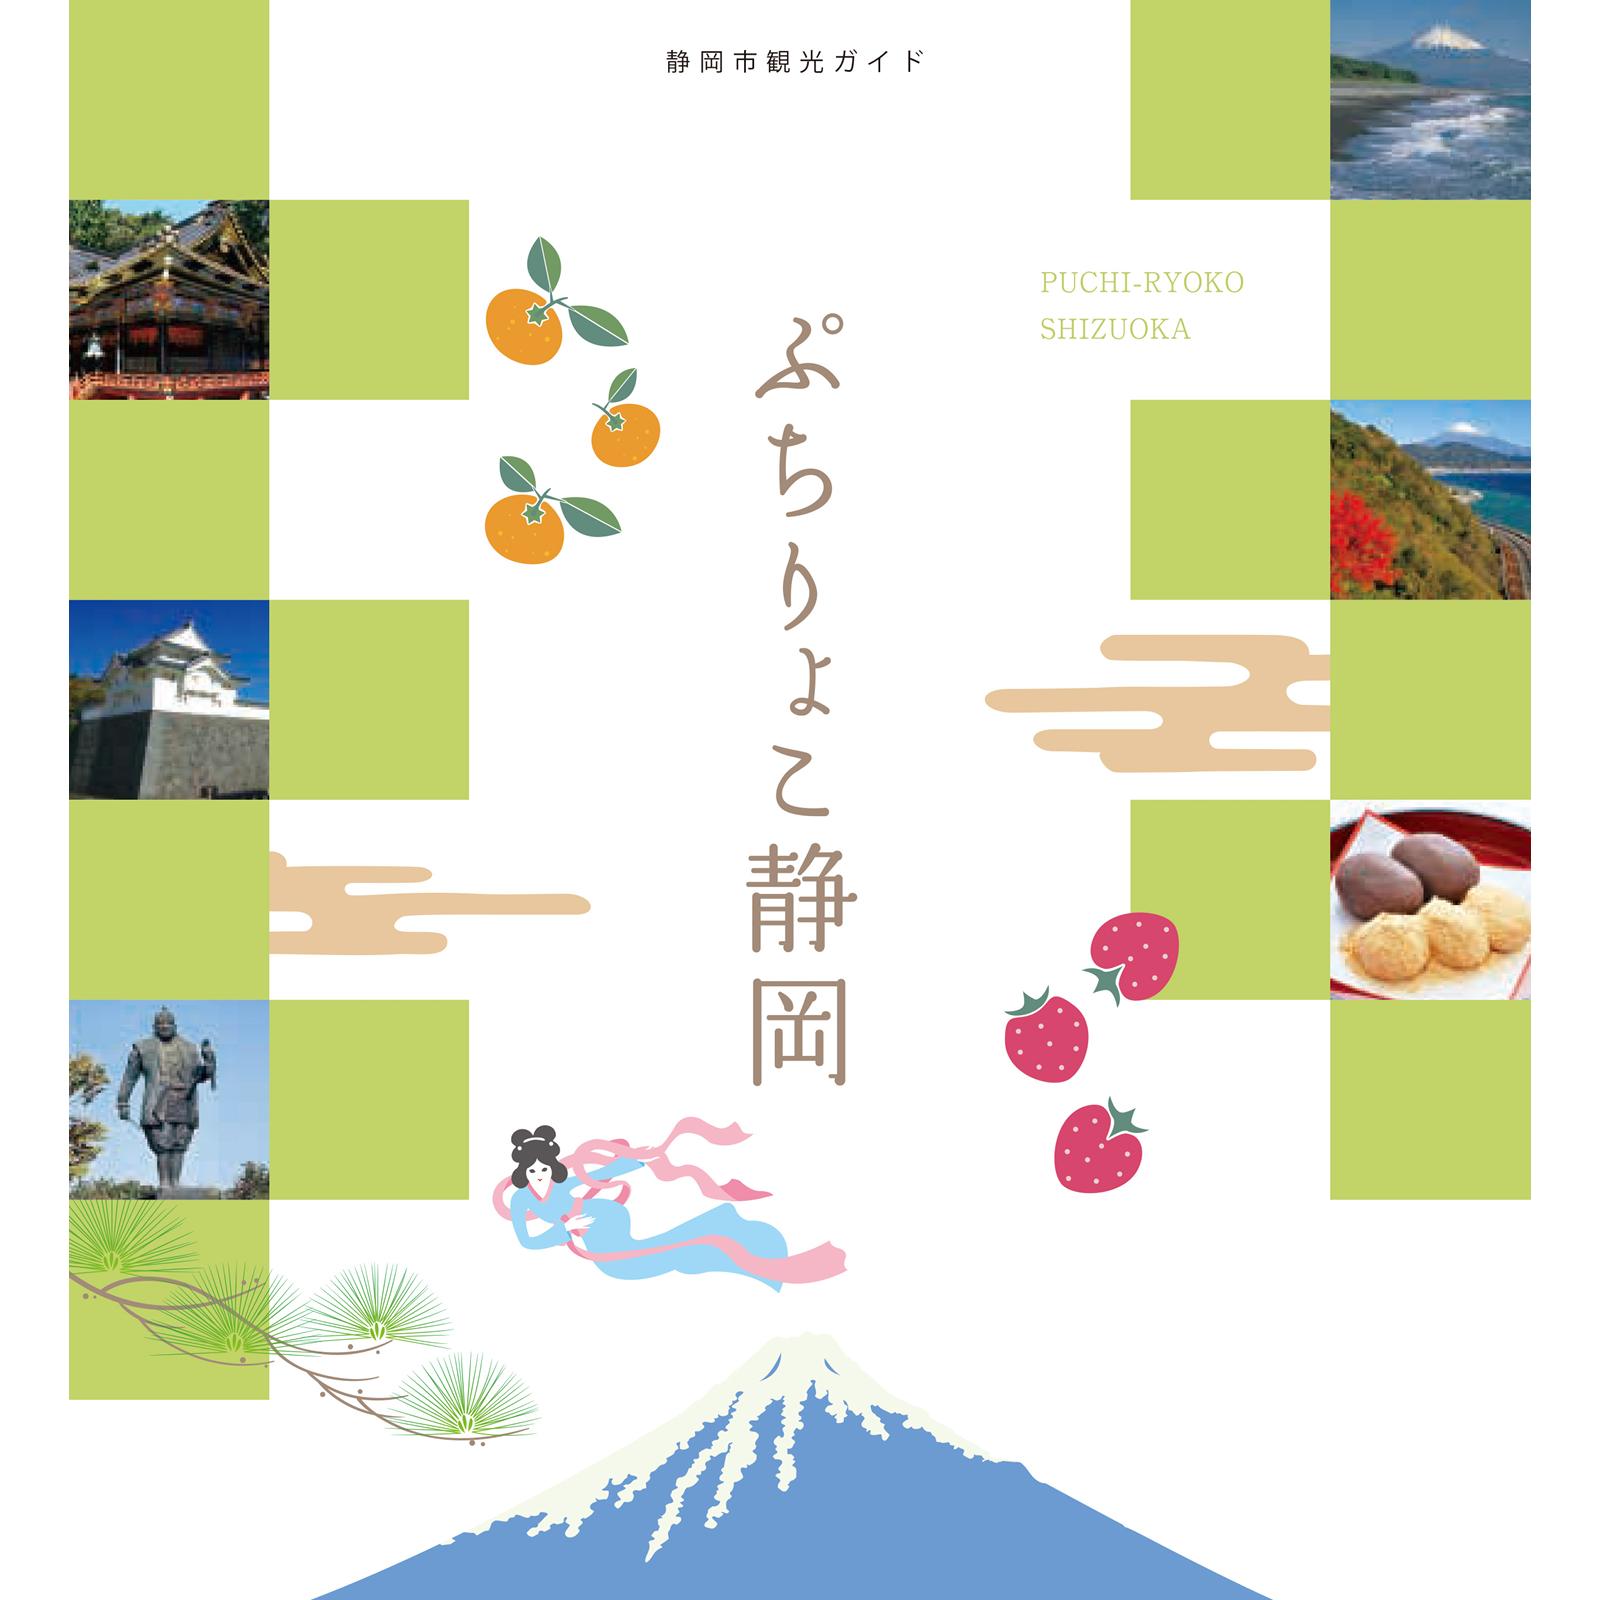 https://www.shizuoka-cb.com/wp-content/uploads/2021/03/bannerQ-1600x1600-1.png